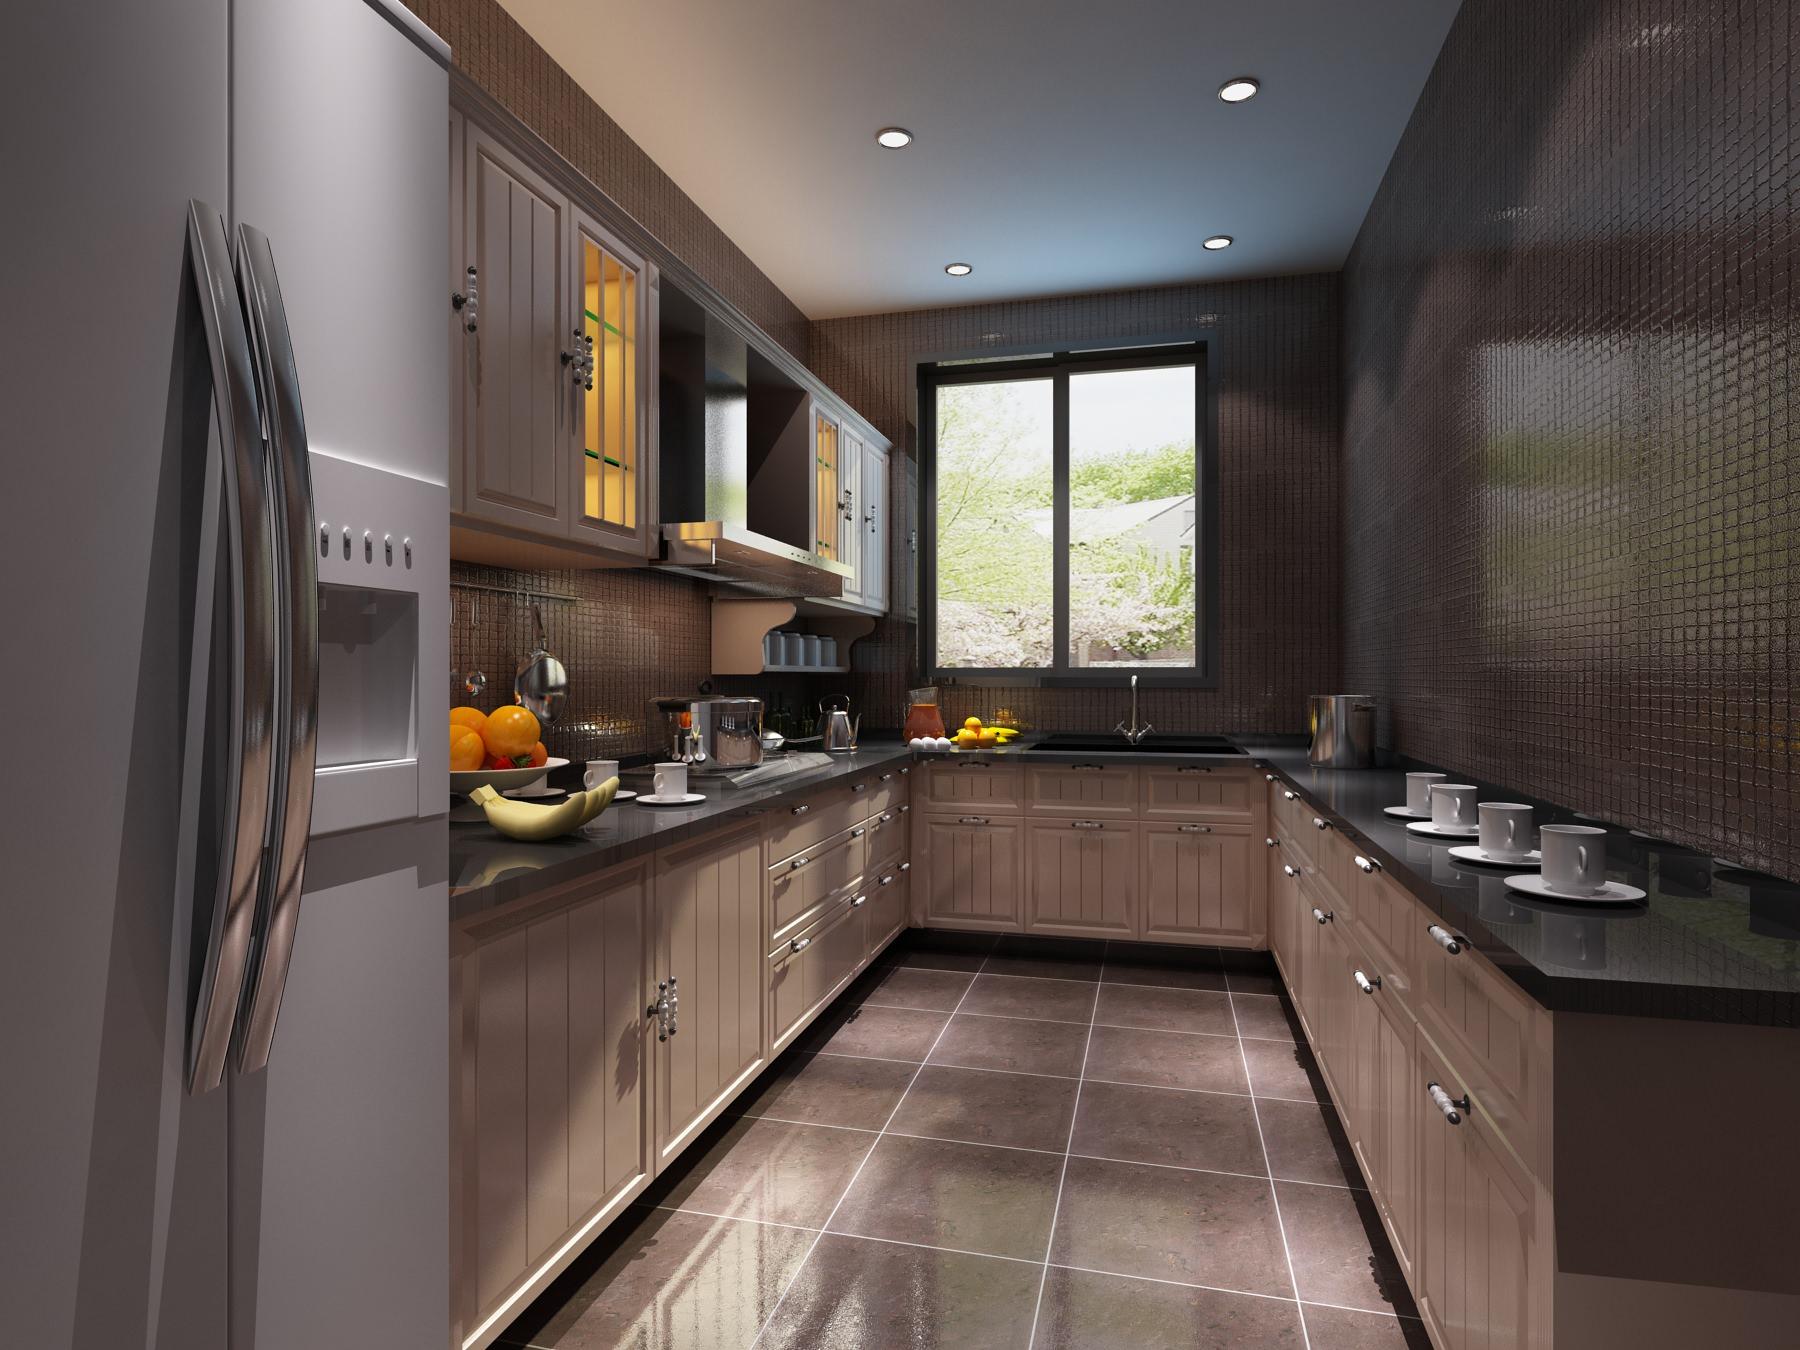 Modern Kitchen Interior With Refrigerator 3d Model Max